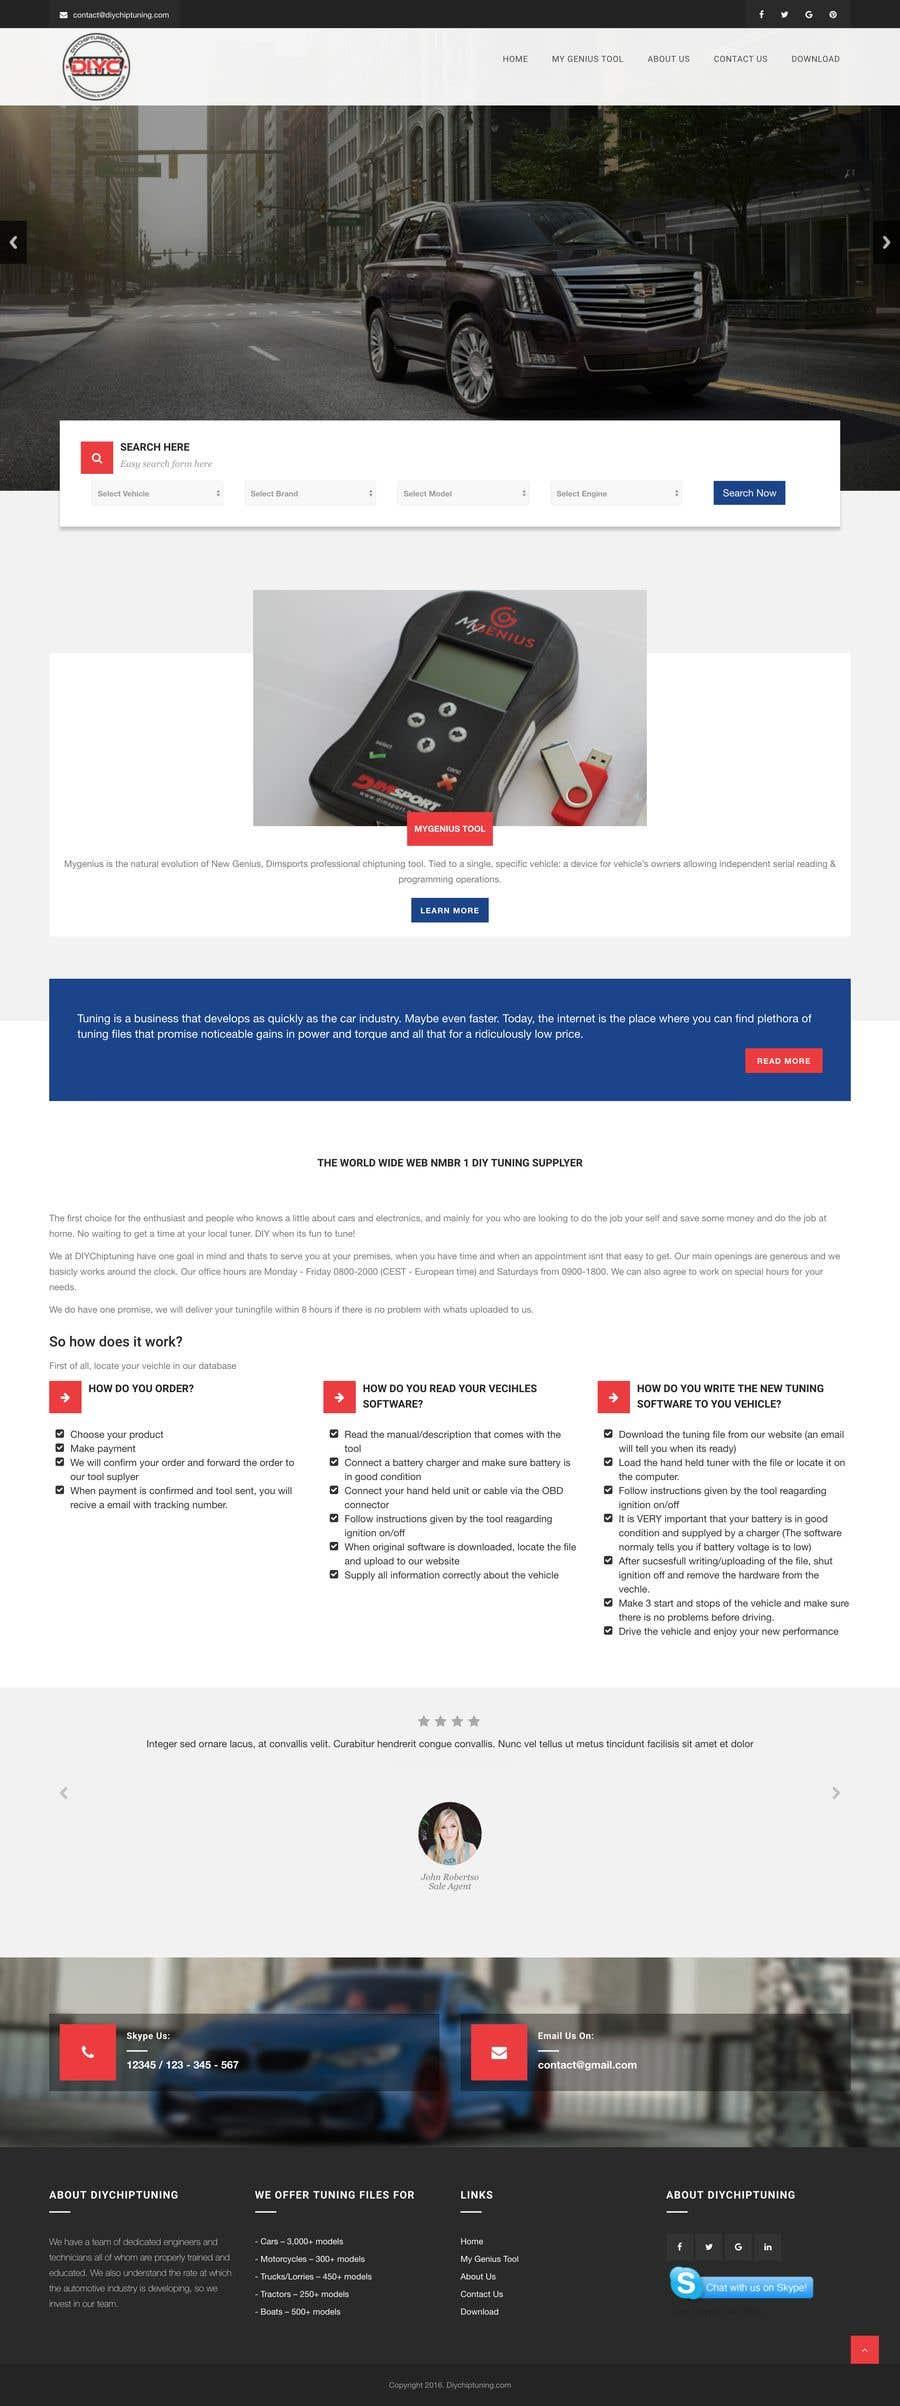 Penyertaan Peraduan #                                        3                                      untuk                                         Product drop list on website with database